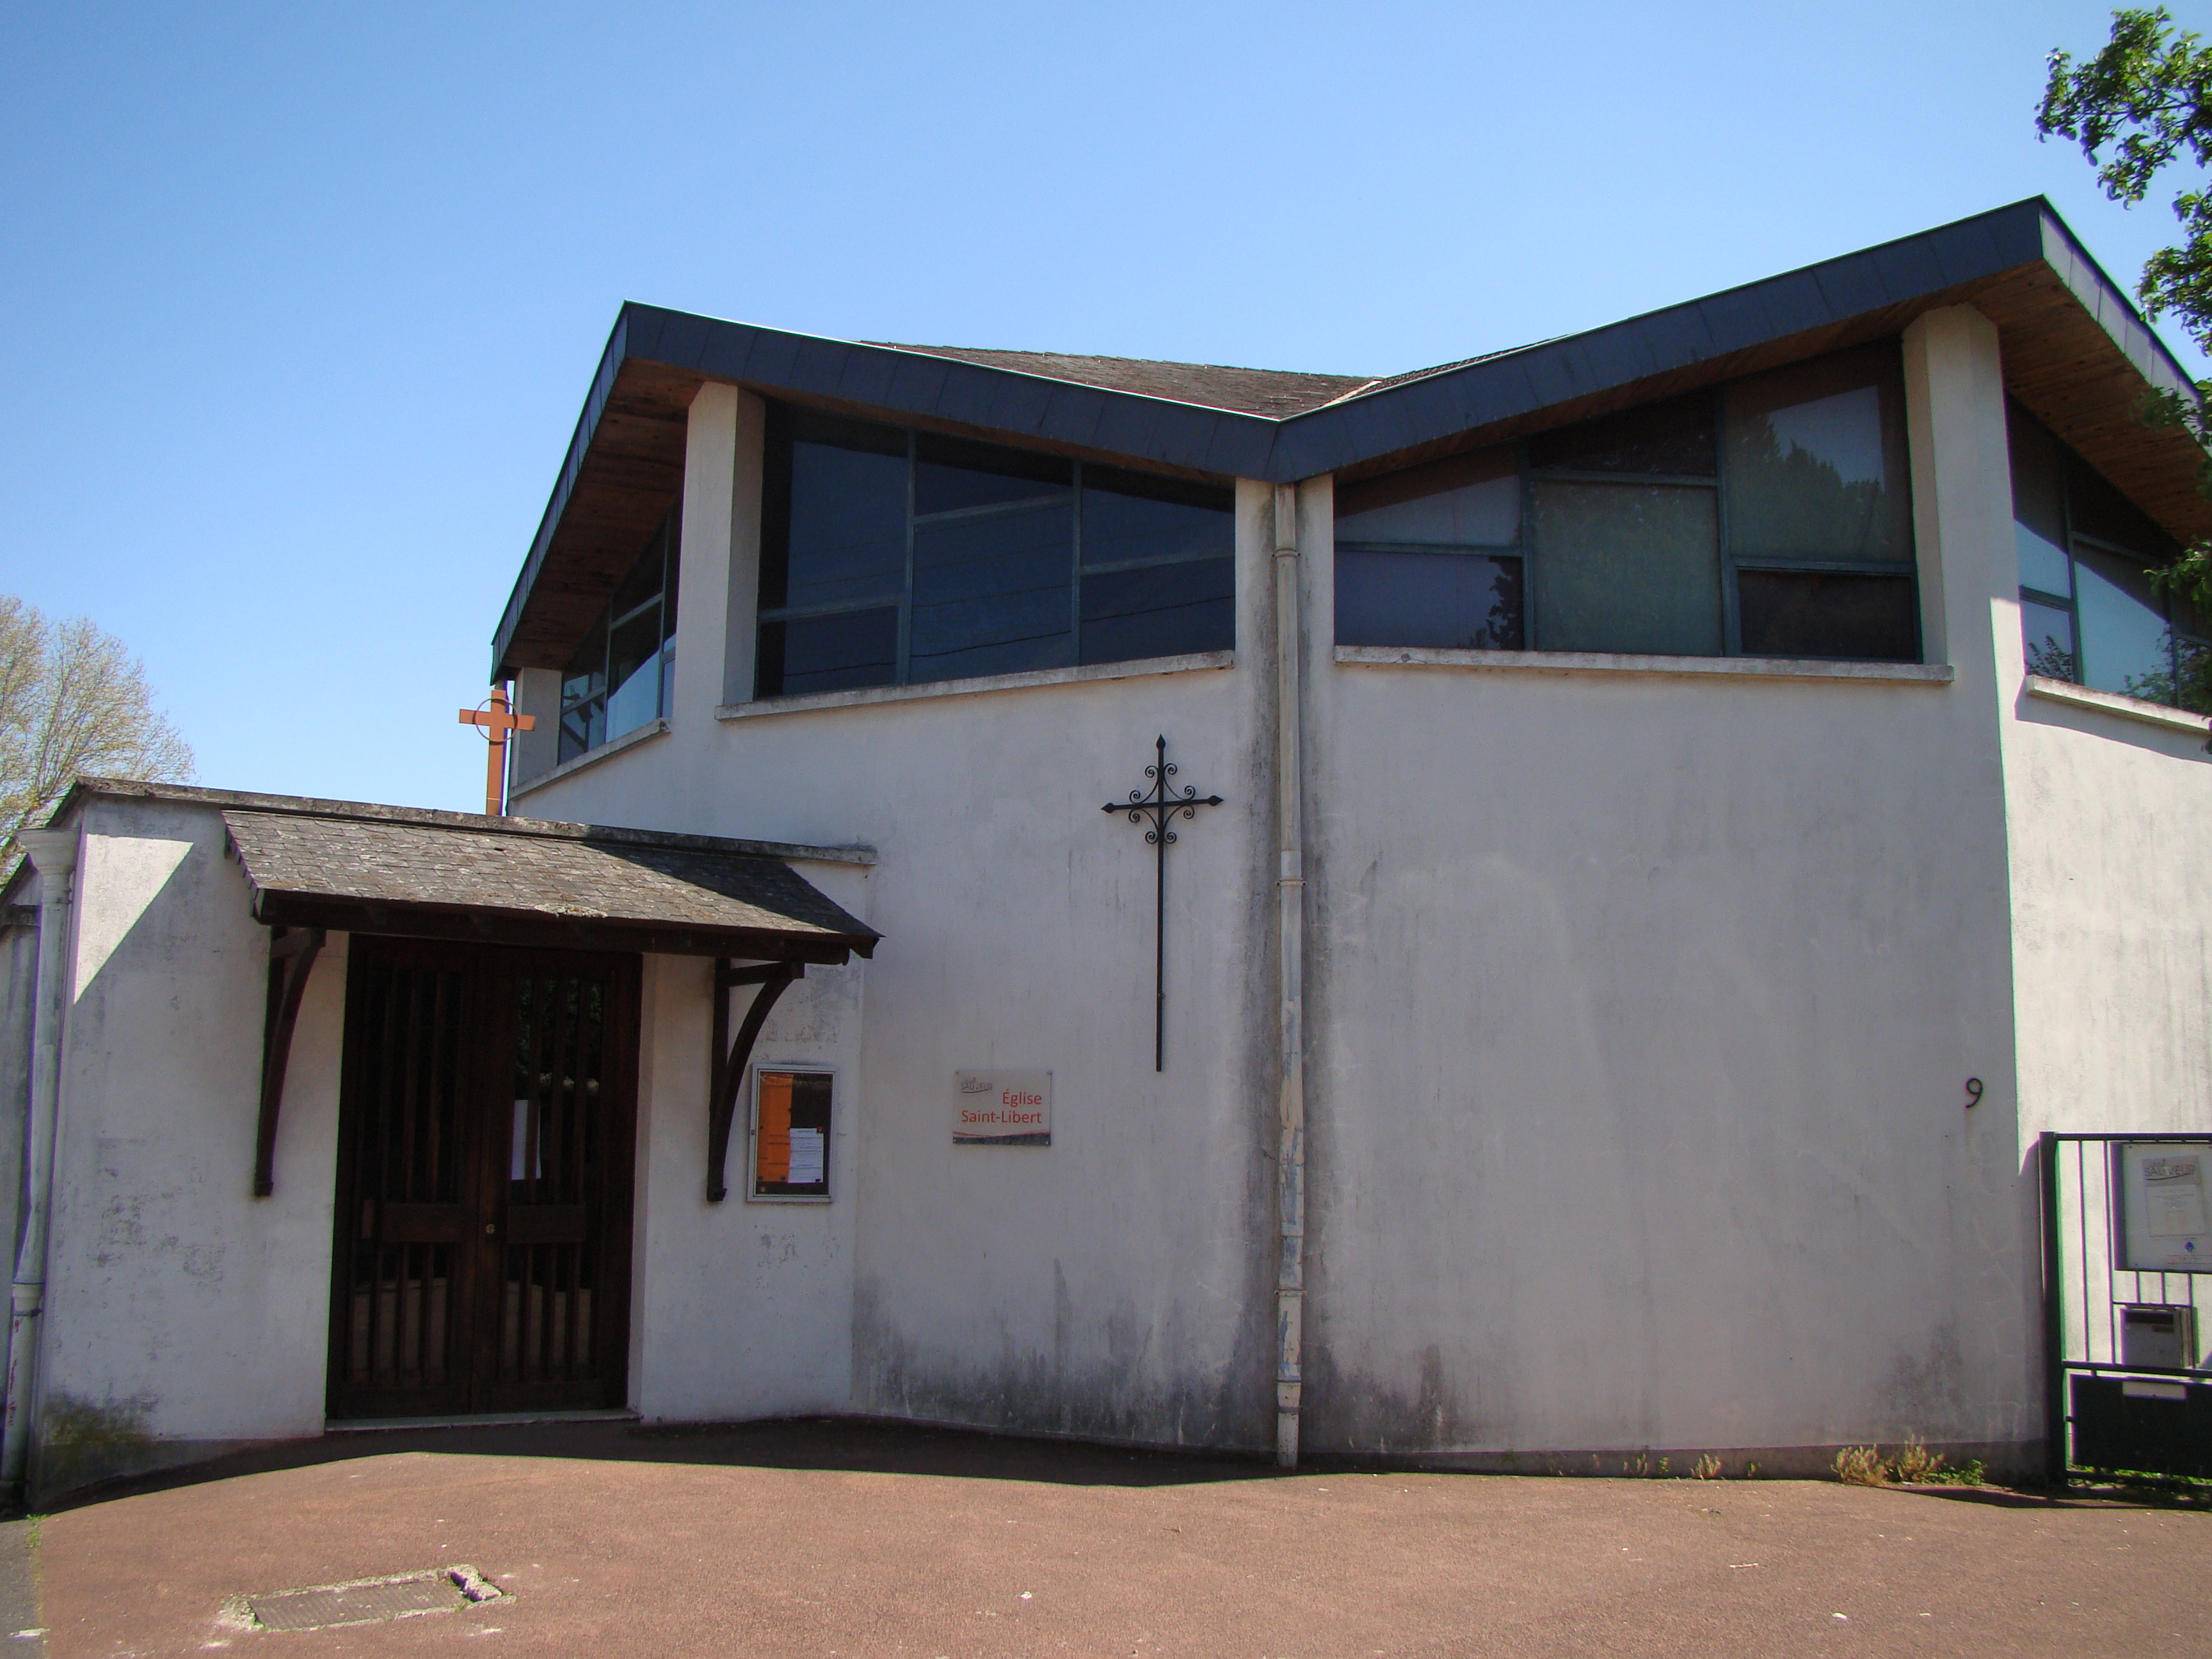 Eglise St Libert